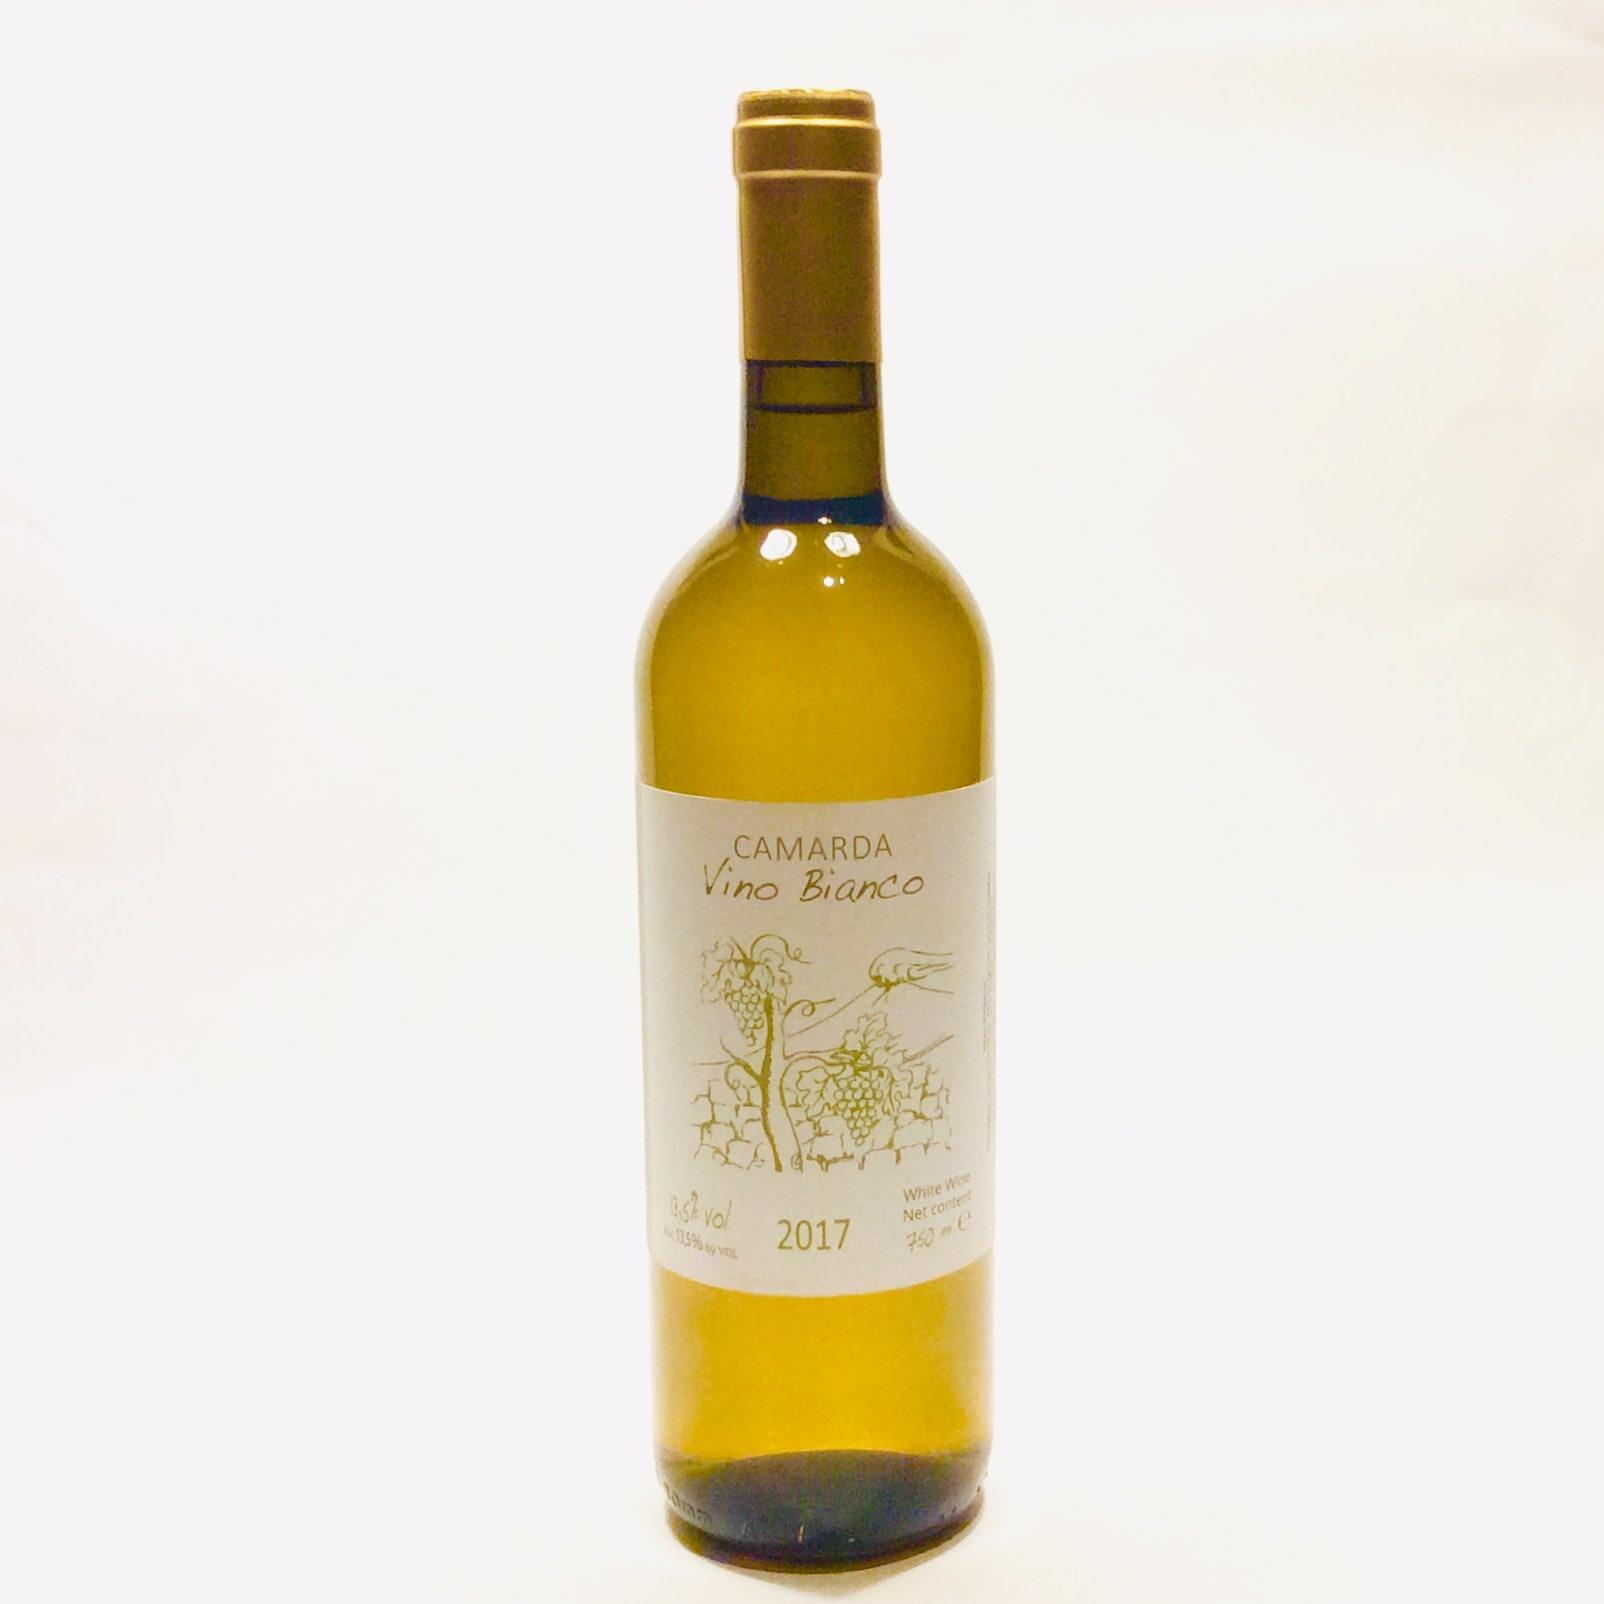 Camarda - Terres Siciliane Bianco 2017 (750 ml)